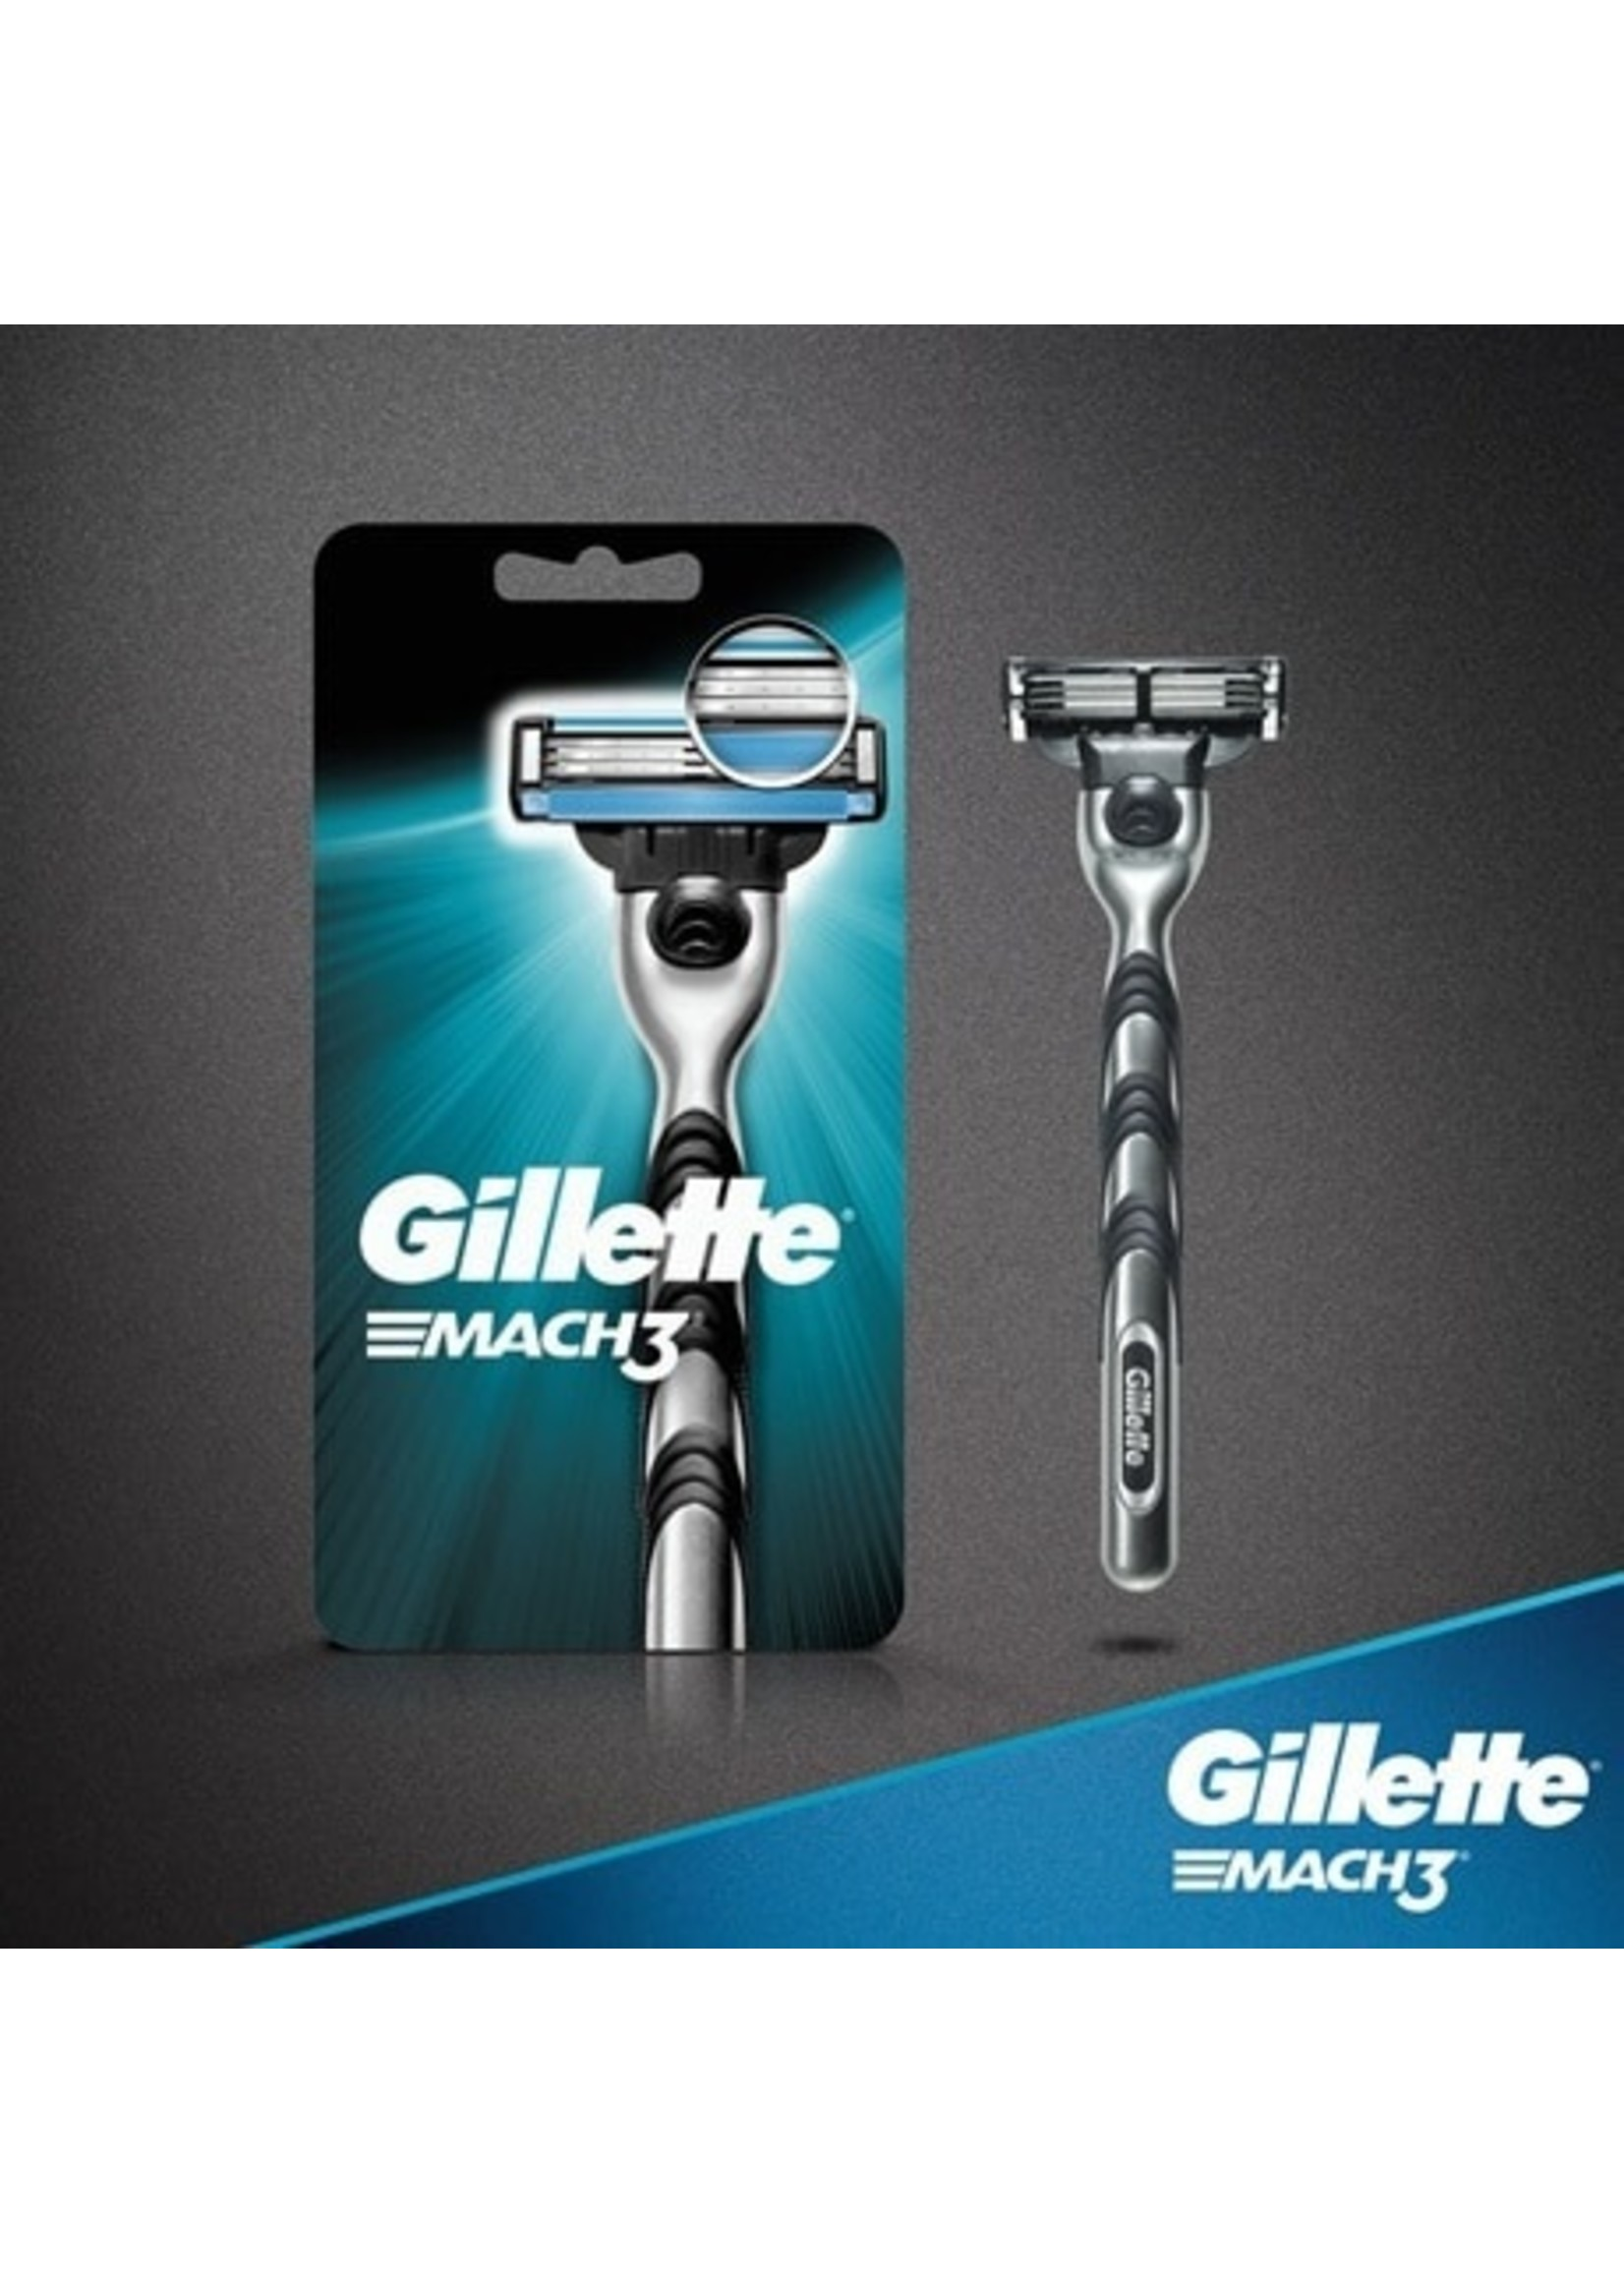 Gillette Mens Mach 3 Razor